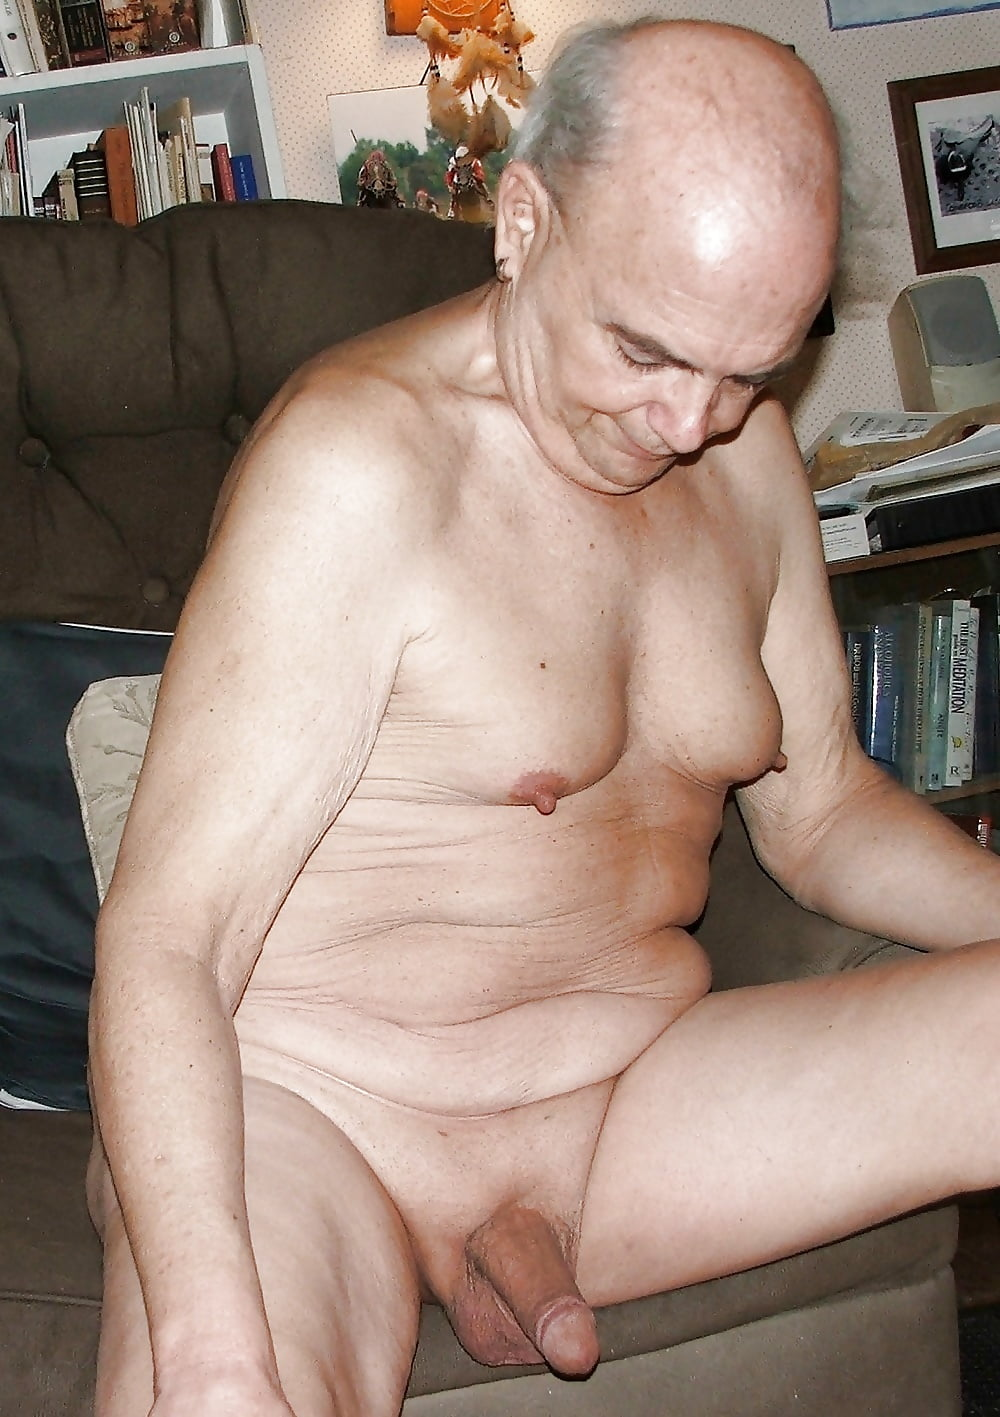 old-man-nacked-young-hot-girls-flashing-pics